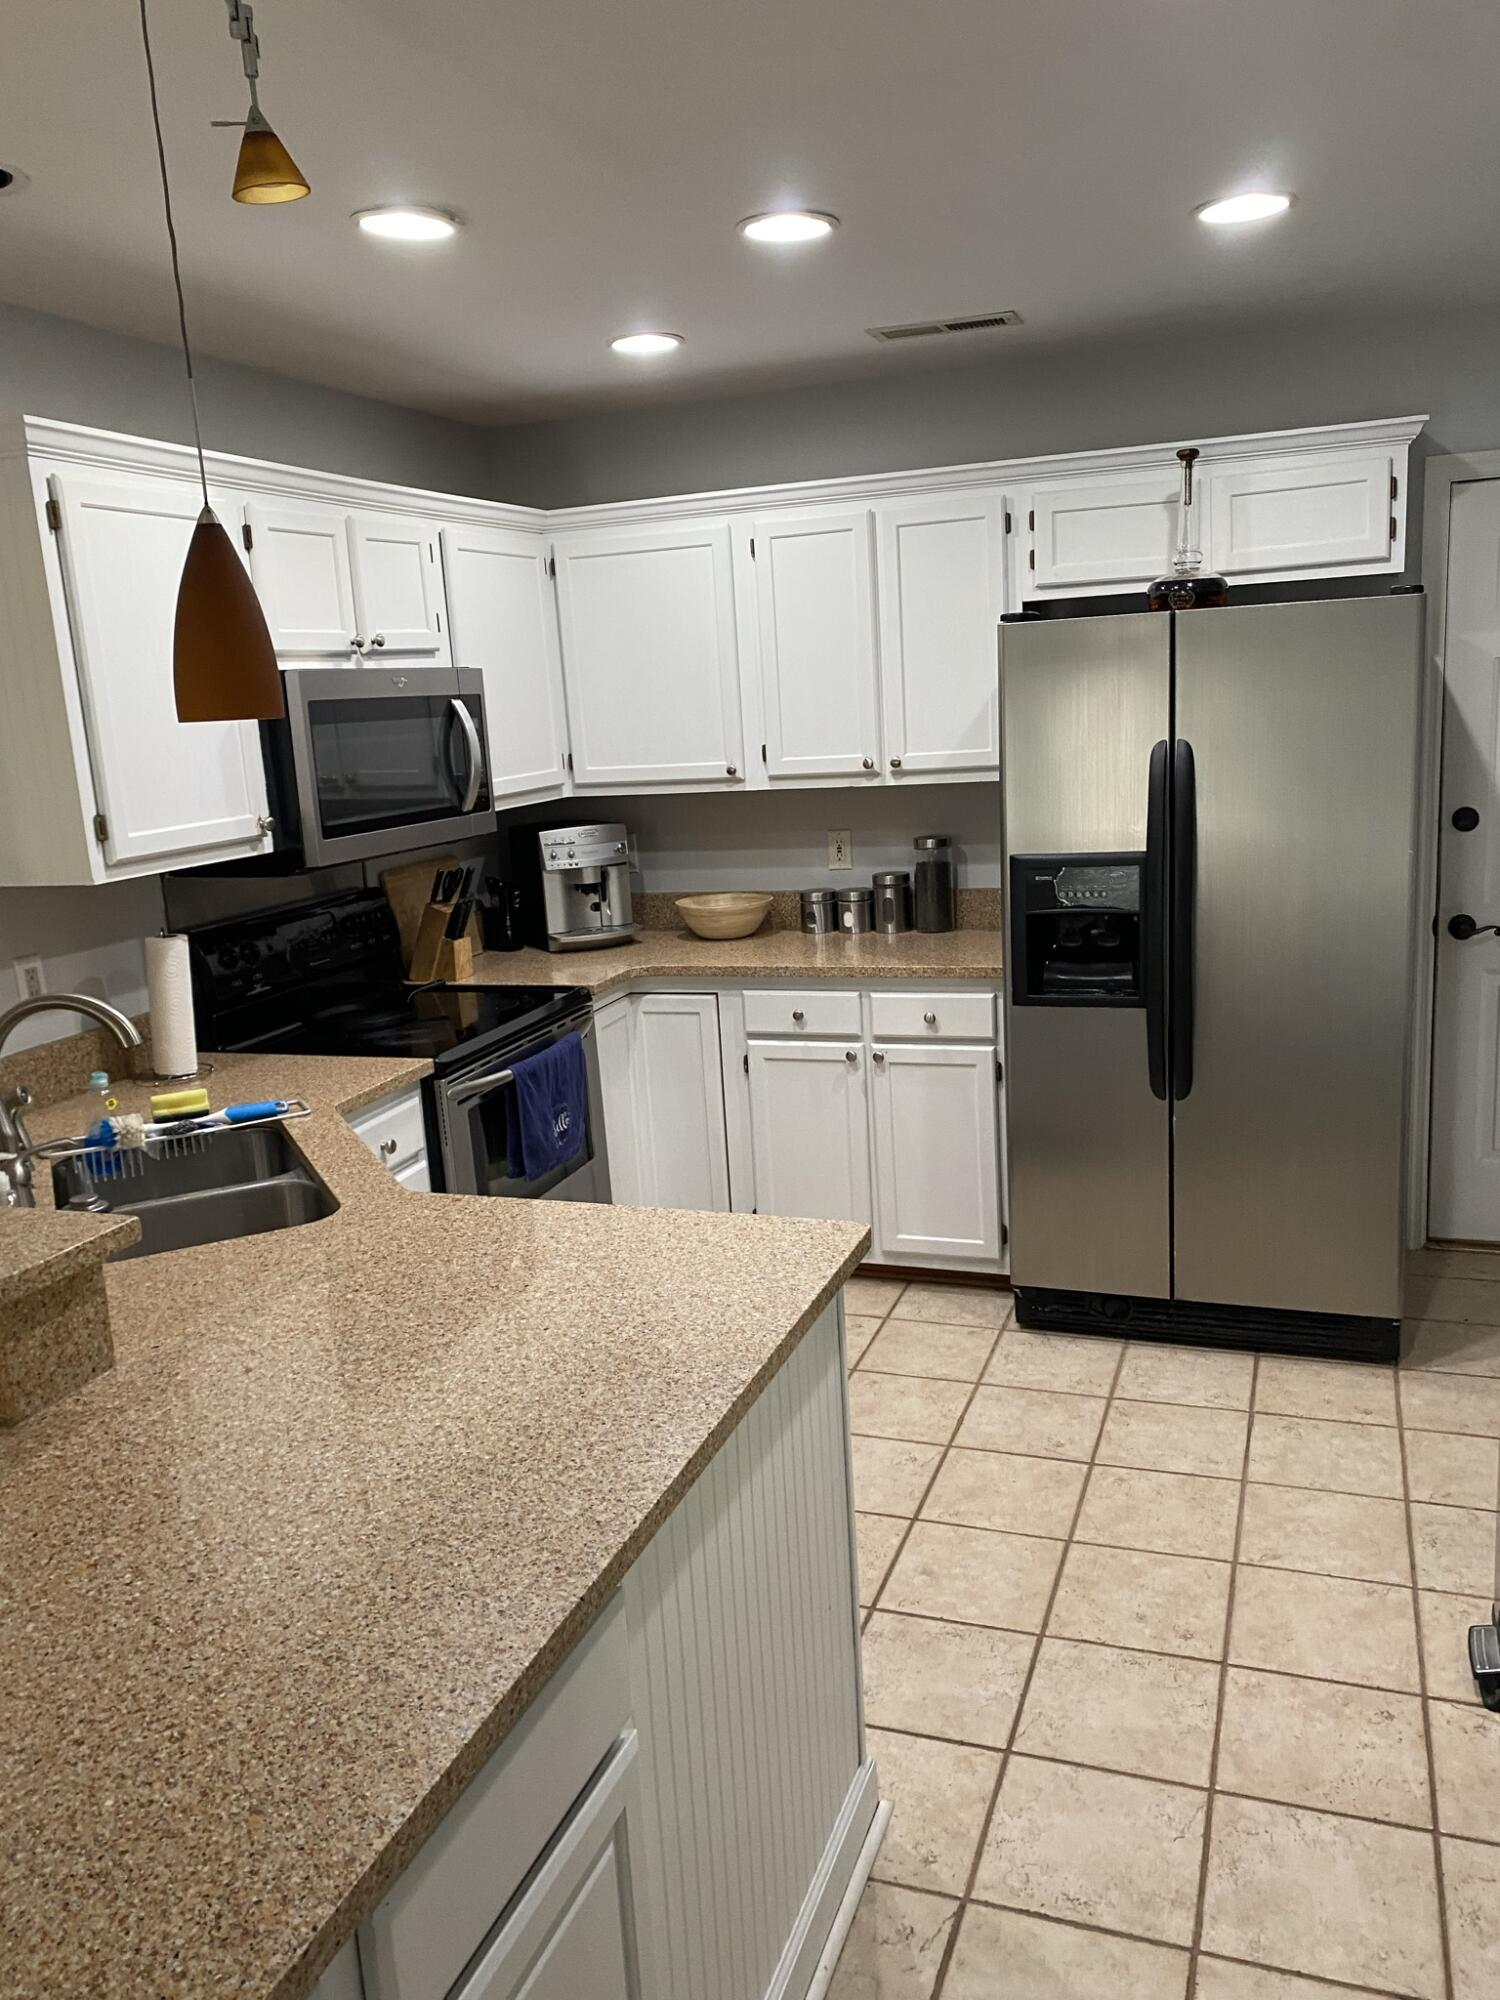 Ivy Hall Homes For Sale - 3158 Morningdale, Mount Pleasant, SC - 6